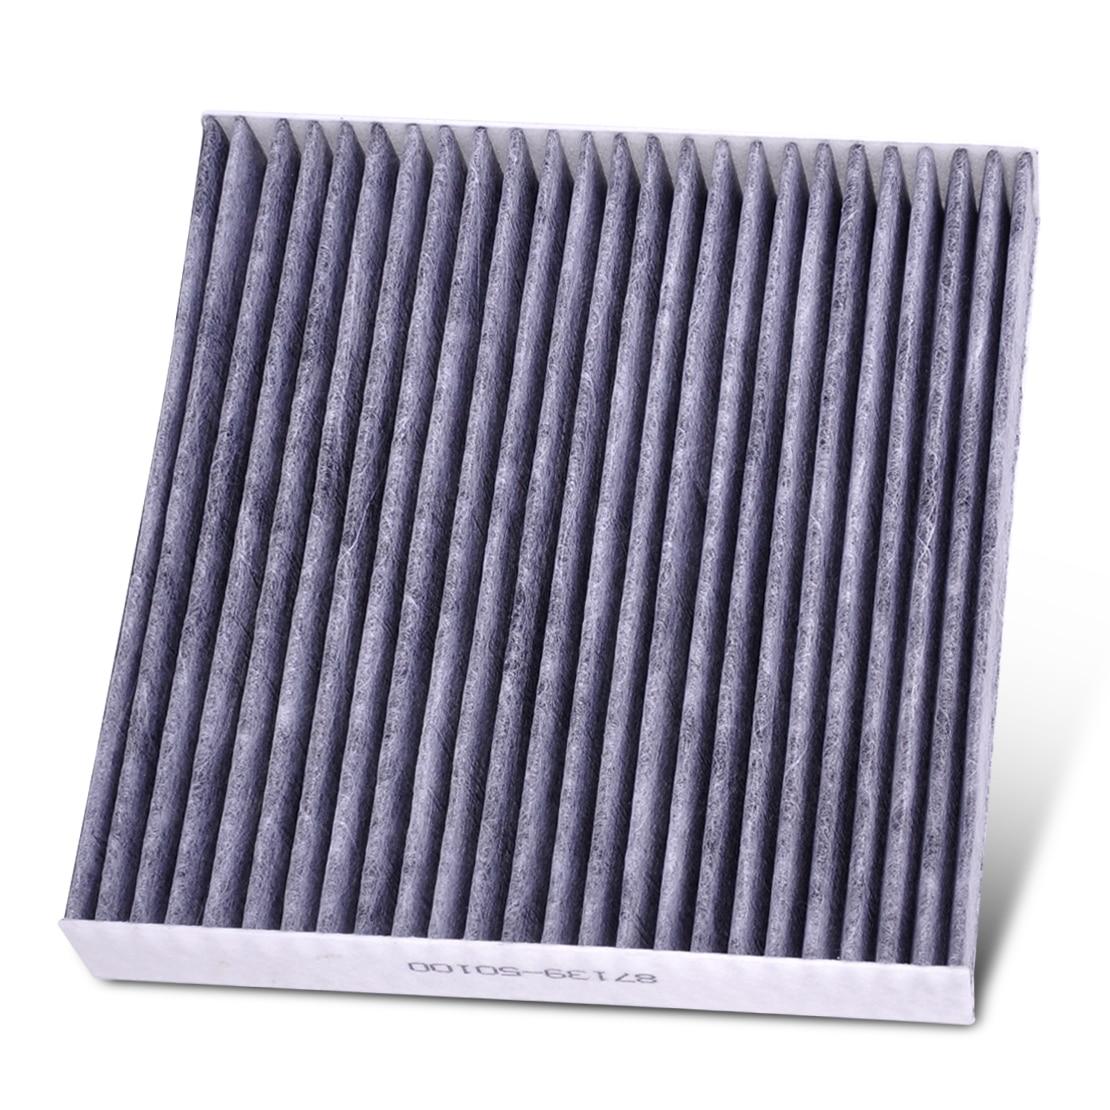 Dwcx car carbon fiber cabin air filter 87139 50100 87139 yzz08 87139 yzz08 for toyota 4runner camry corolla highlander prius